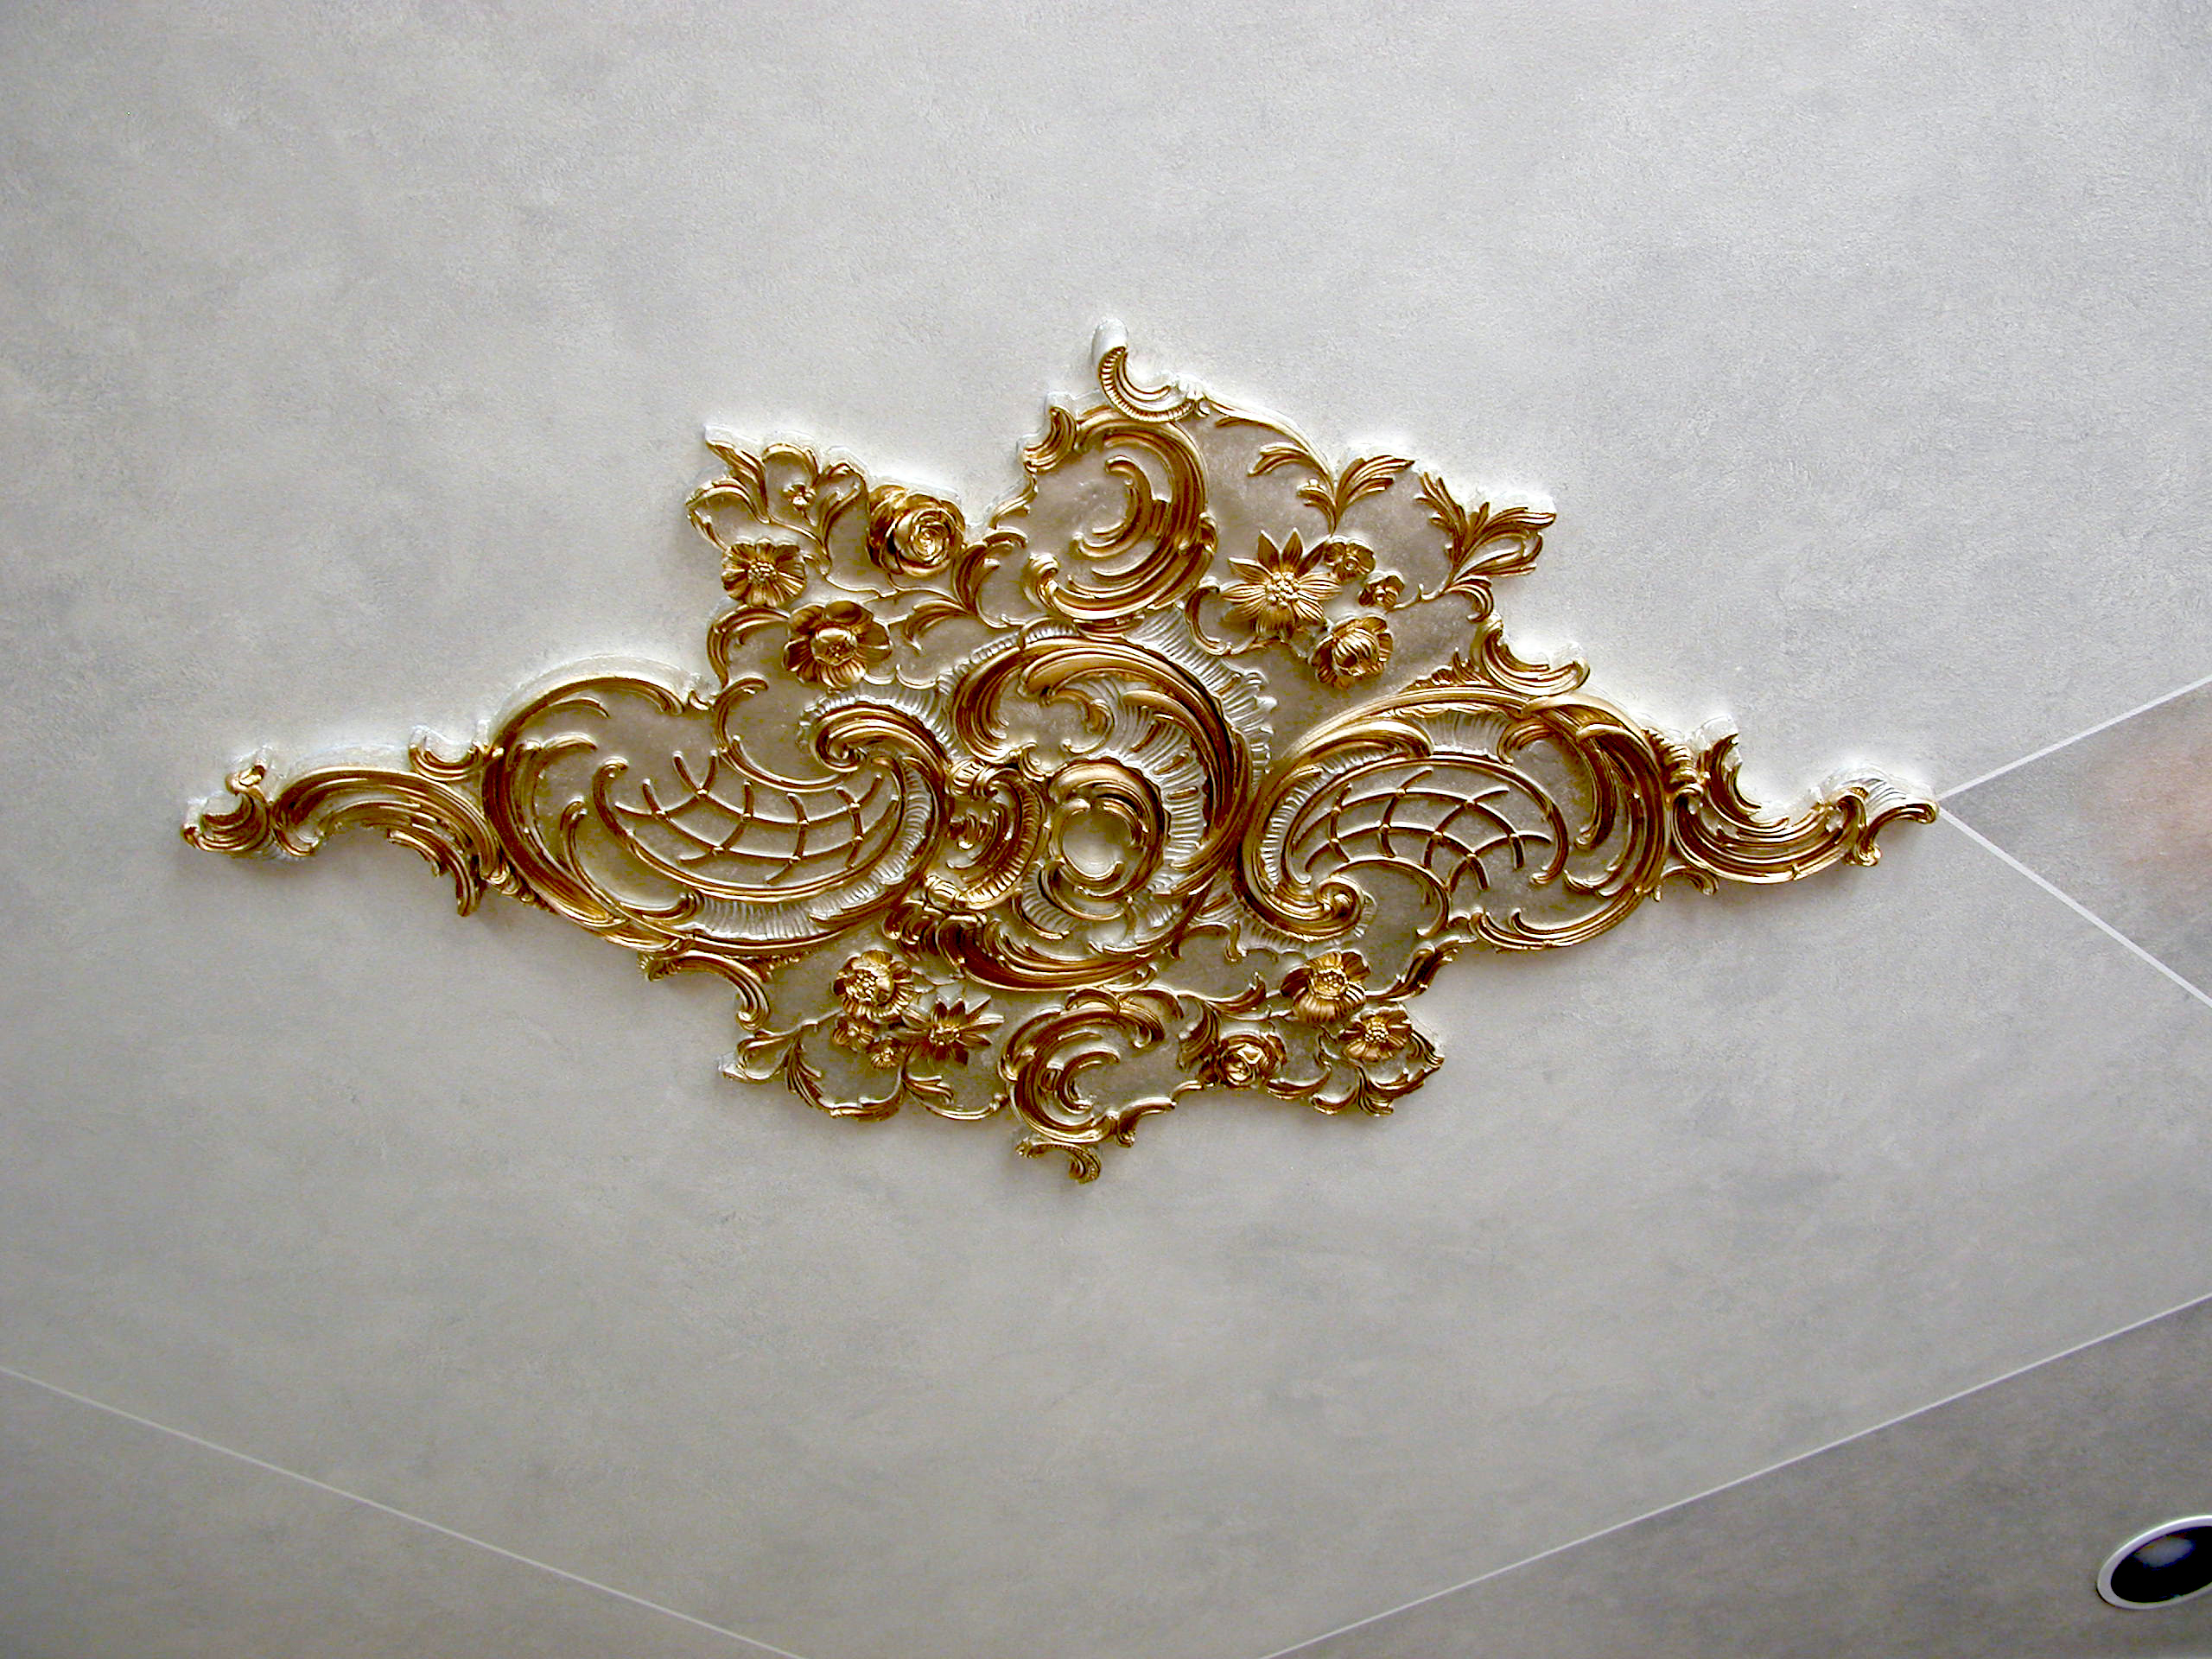 Gold Leaf & Metallic